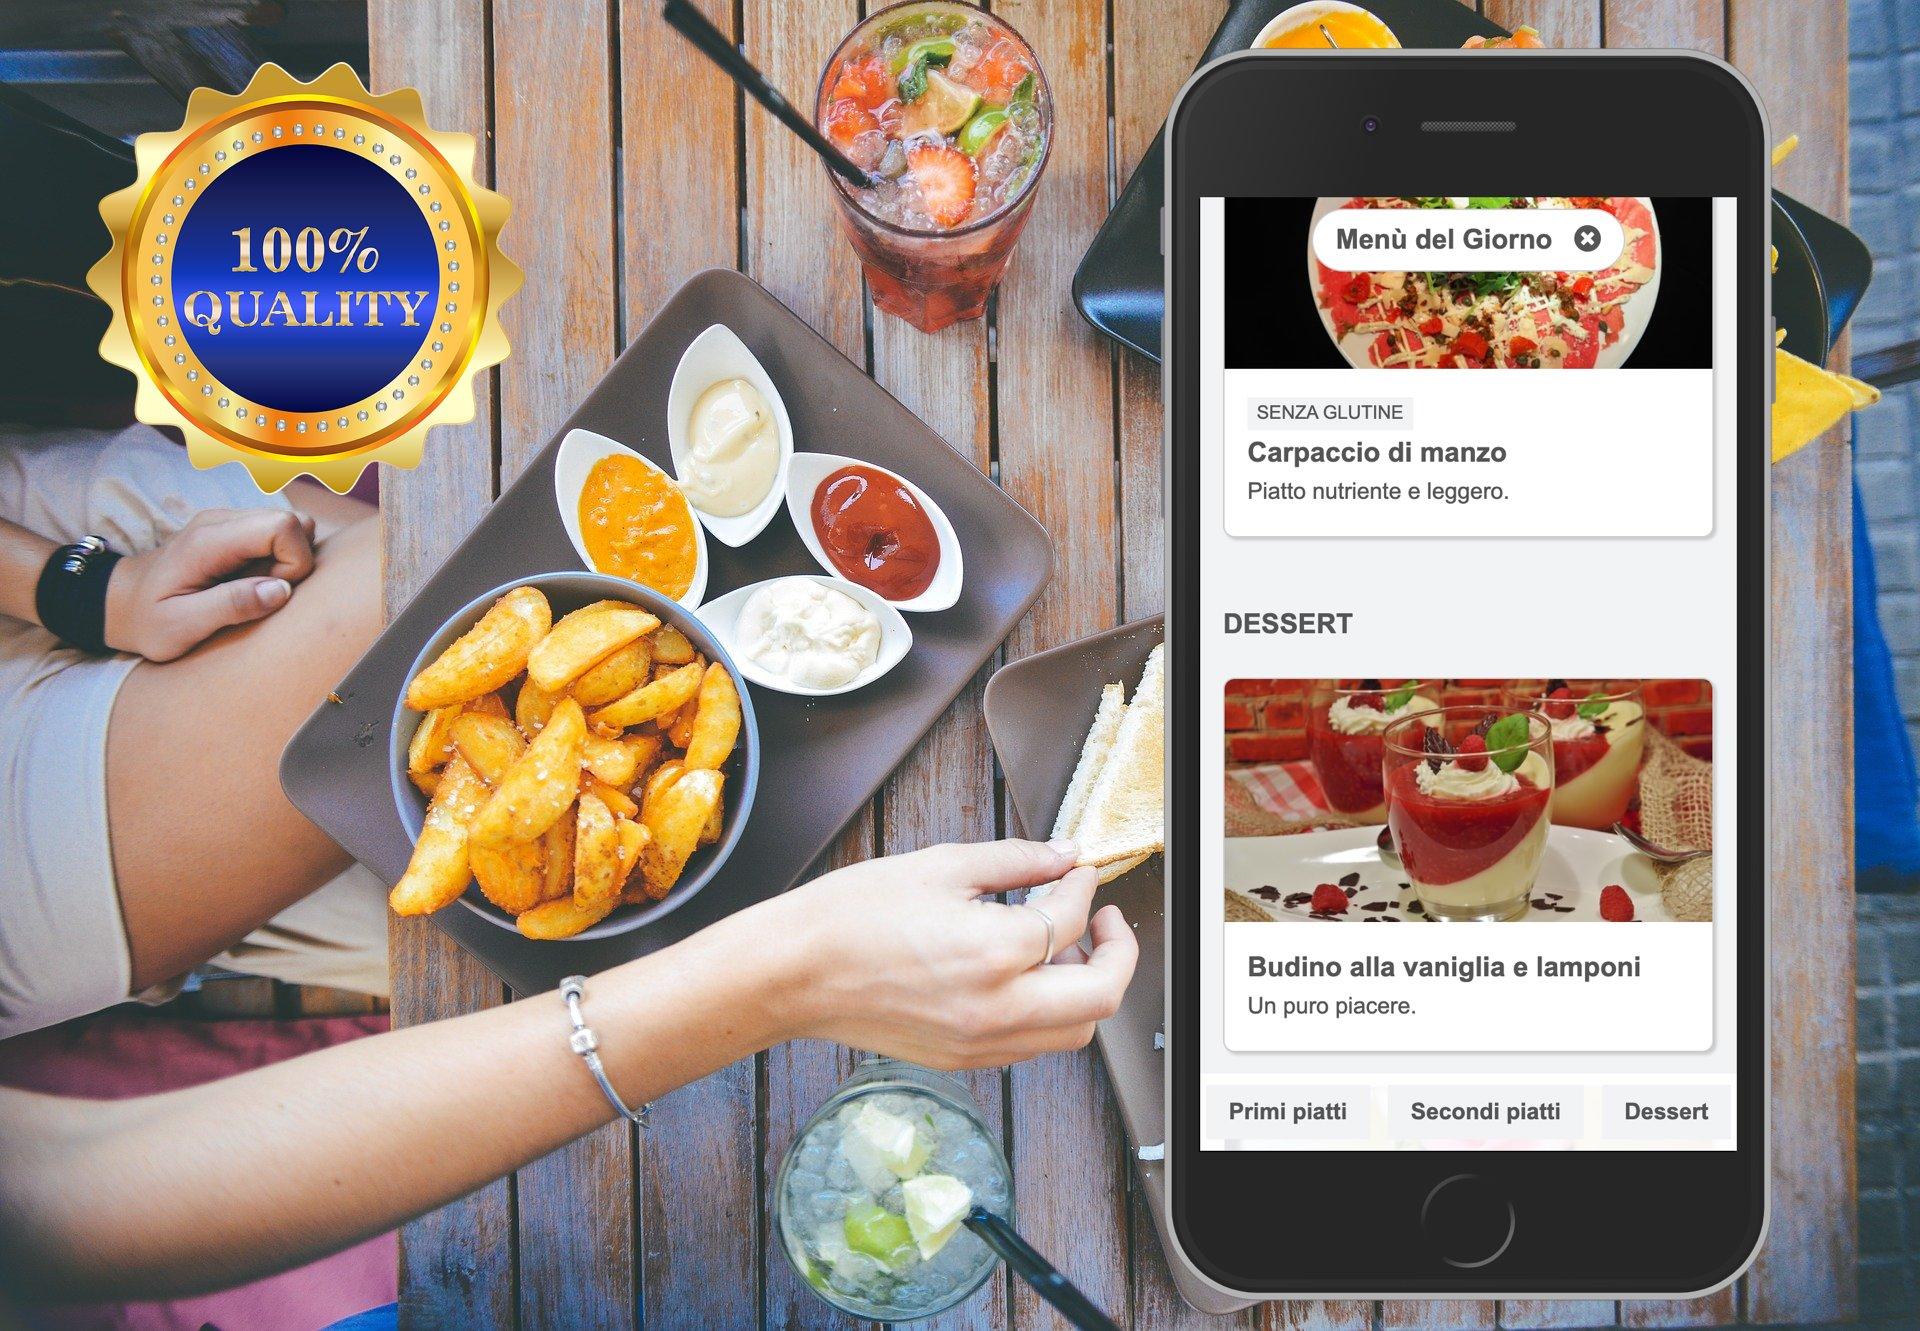 Digital menu quality